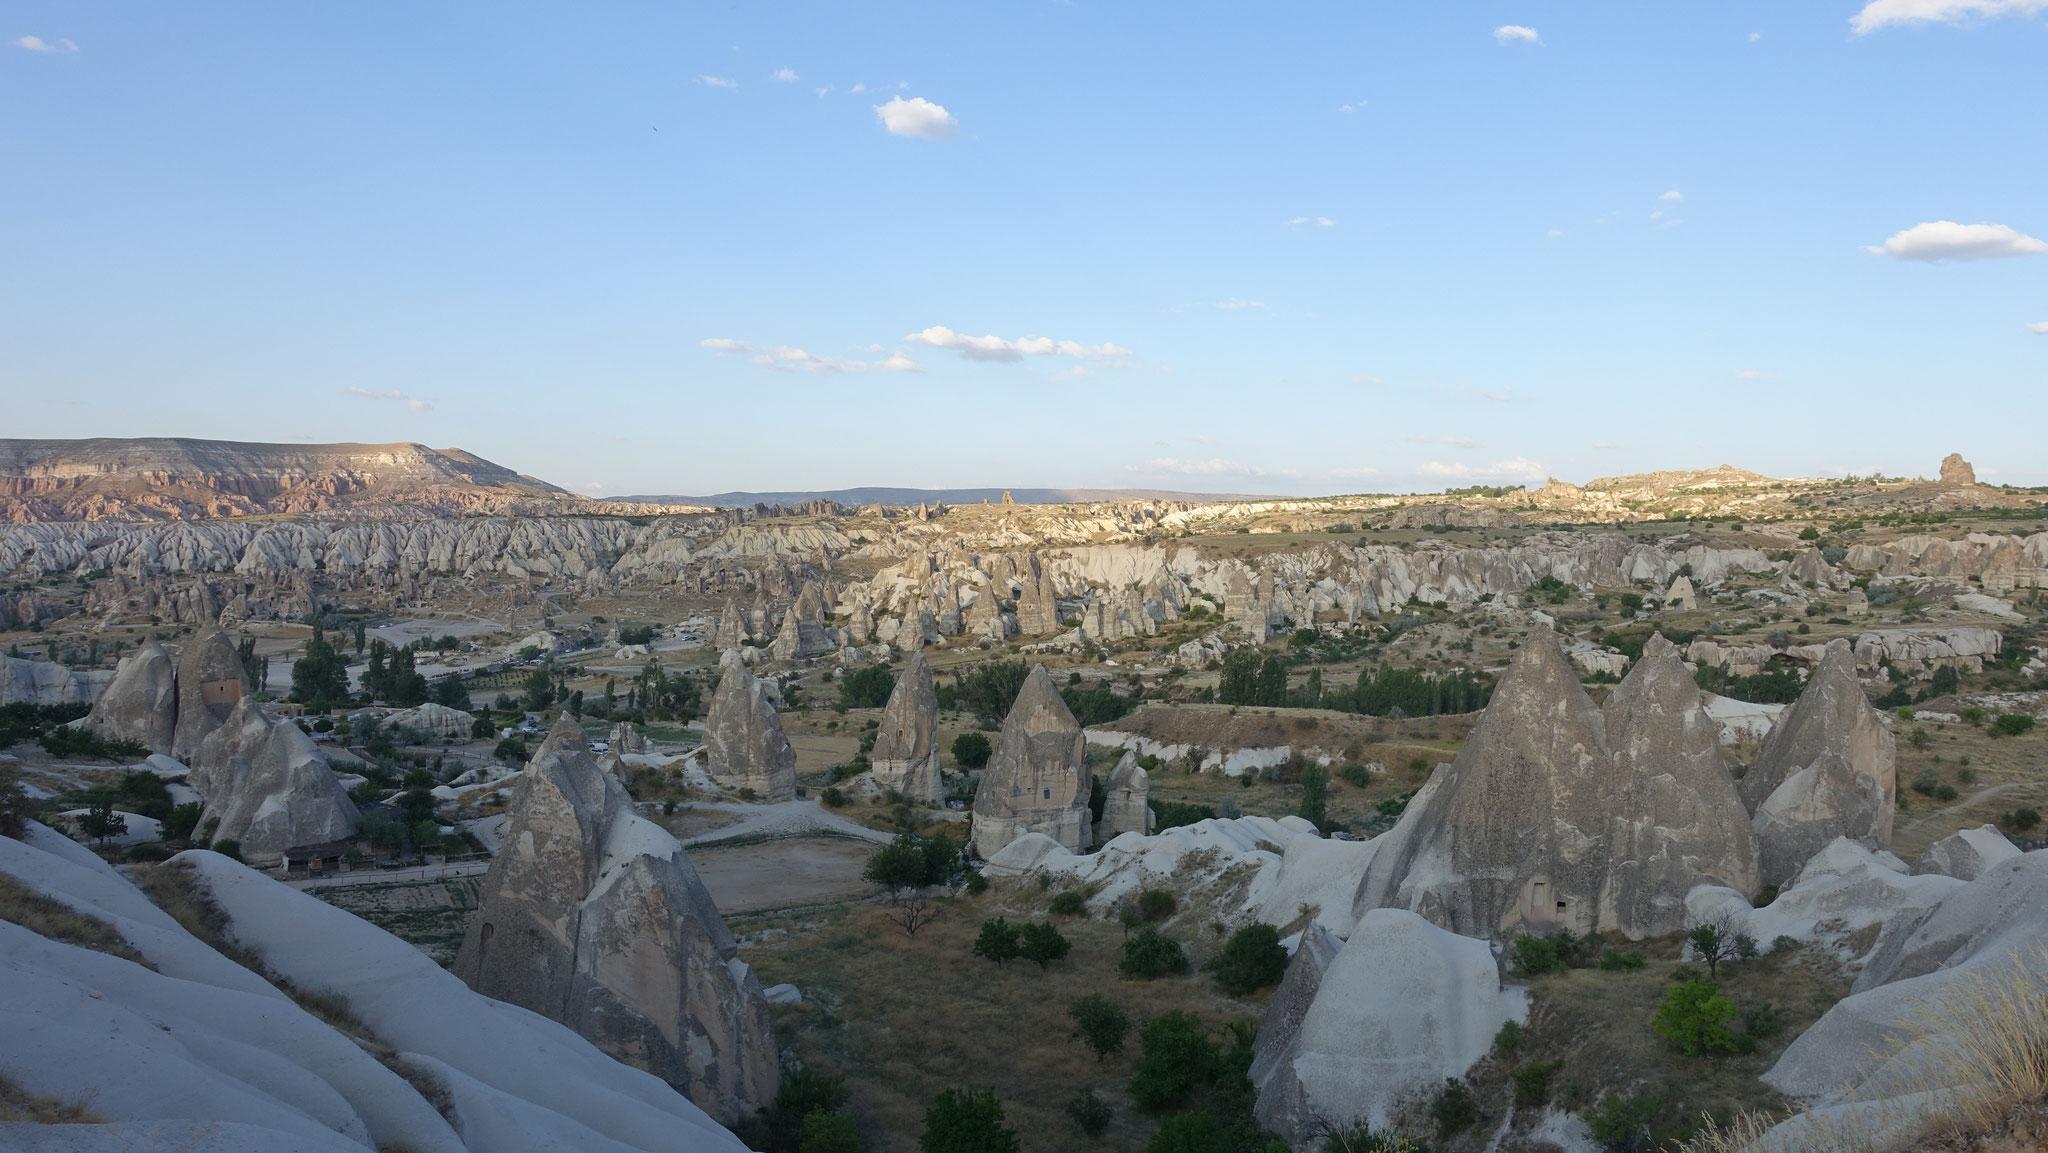 Unglaubliche Landschaft in Kappadokien